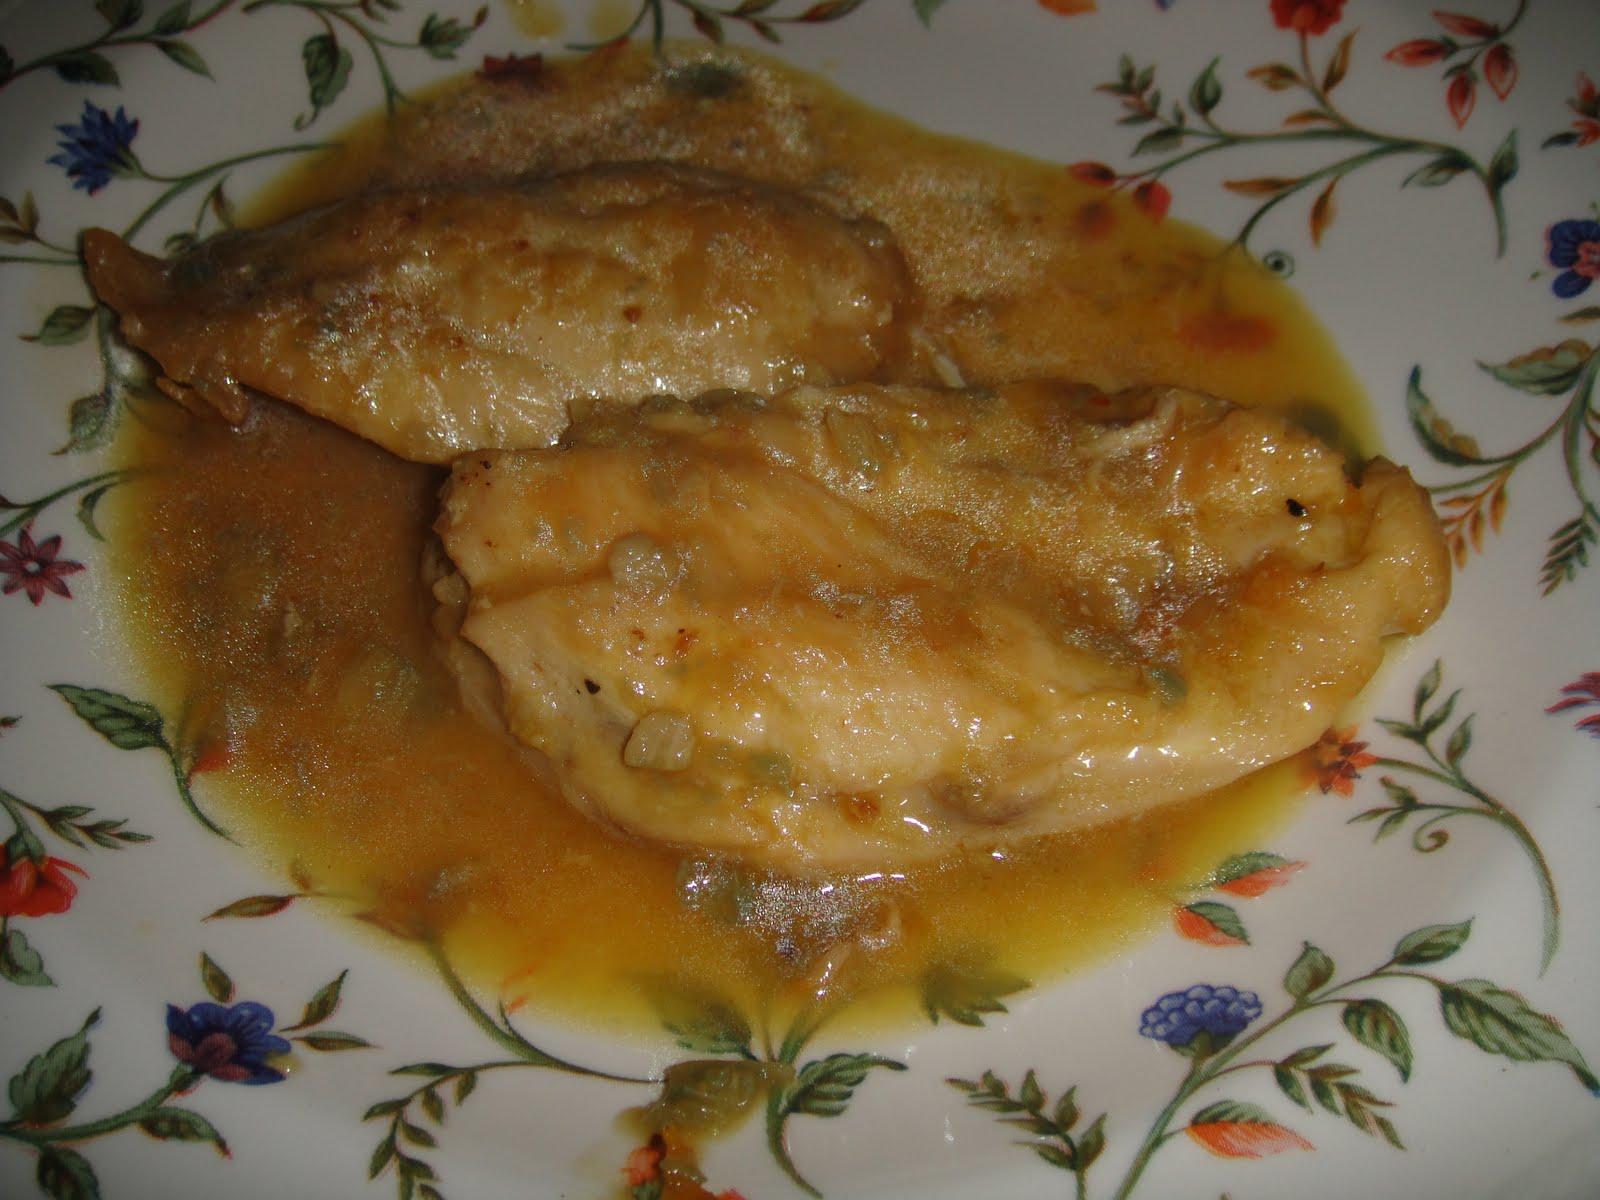 Mis ilusiones pechugas de pollo al limon - Pechugas de pollo al limon ...